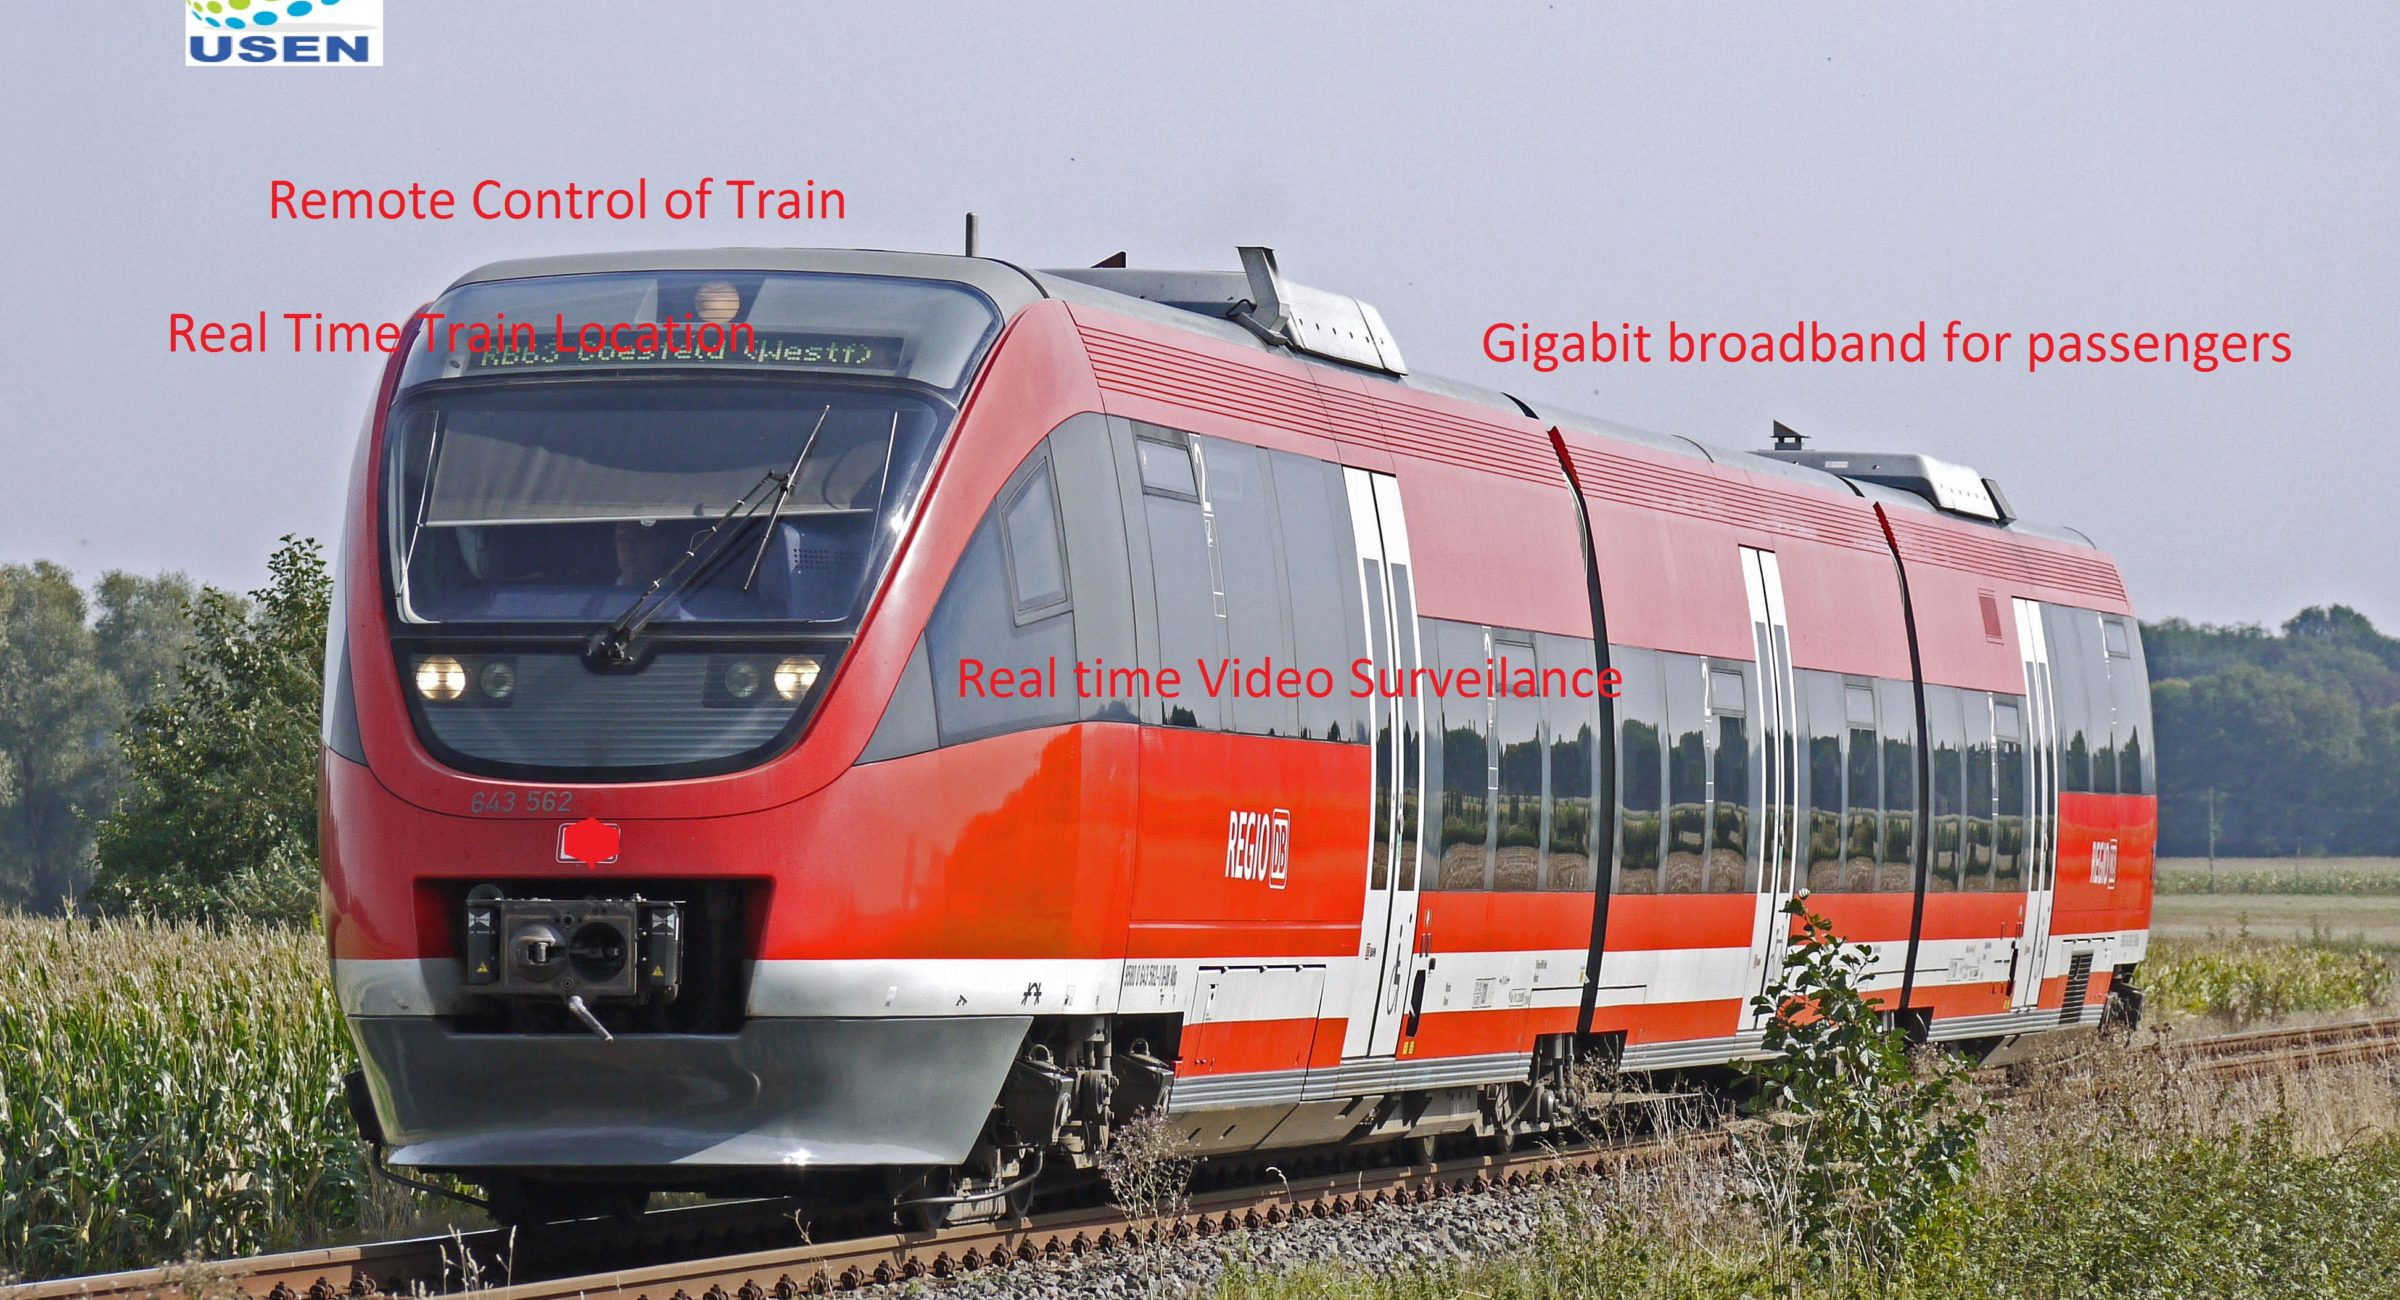 usen train